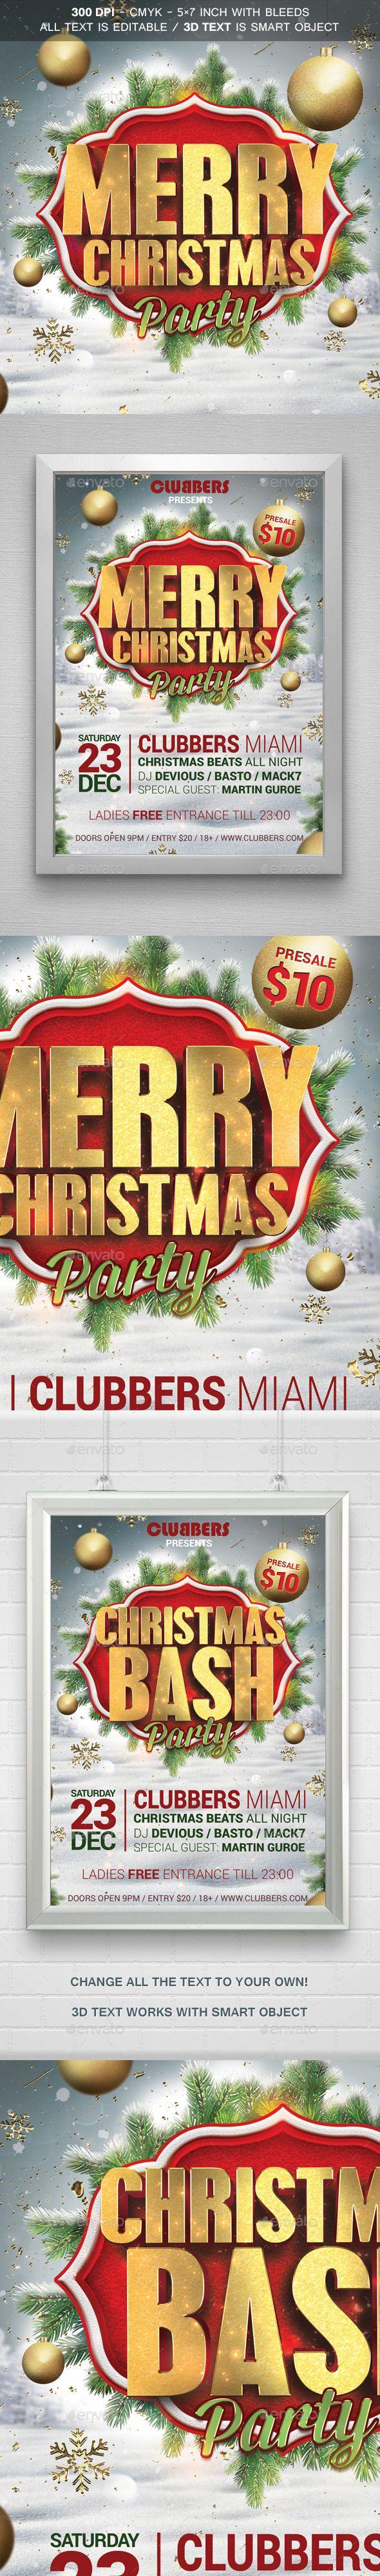 Merry Christmas Flyer Template PSD #design #xmas Download: http://graphicriver.net/item/merry-christmas-flyer-v2/9624029?ref=ksioks